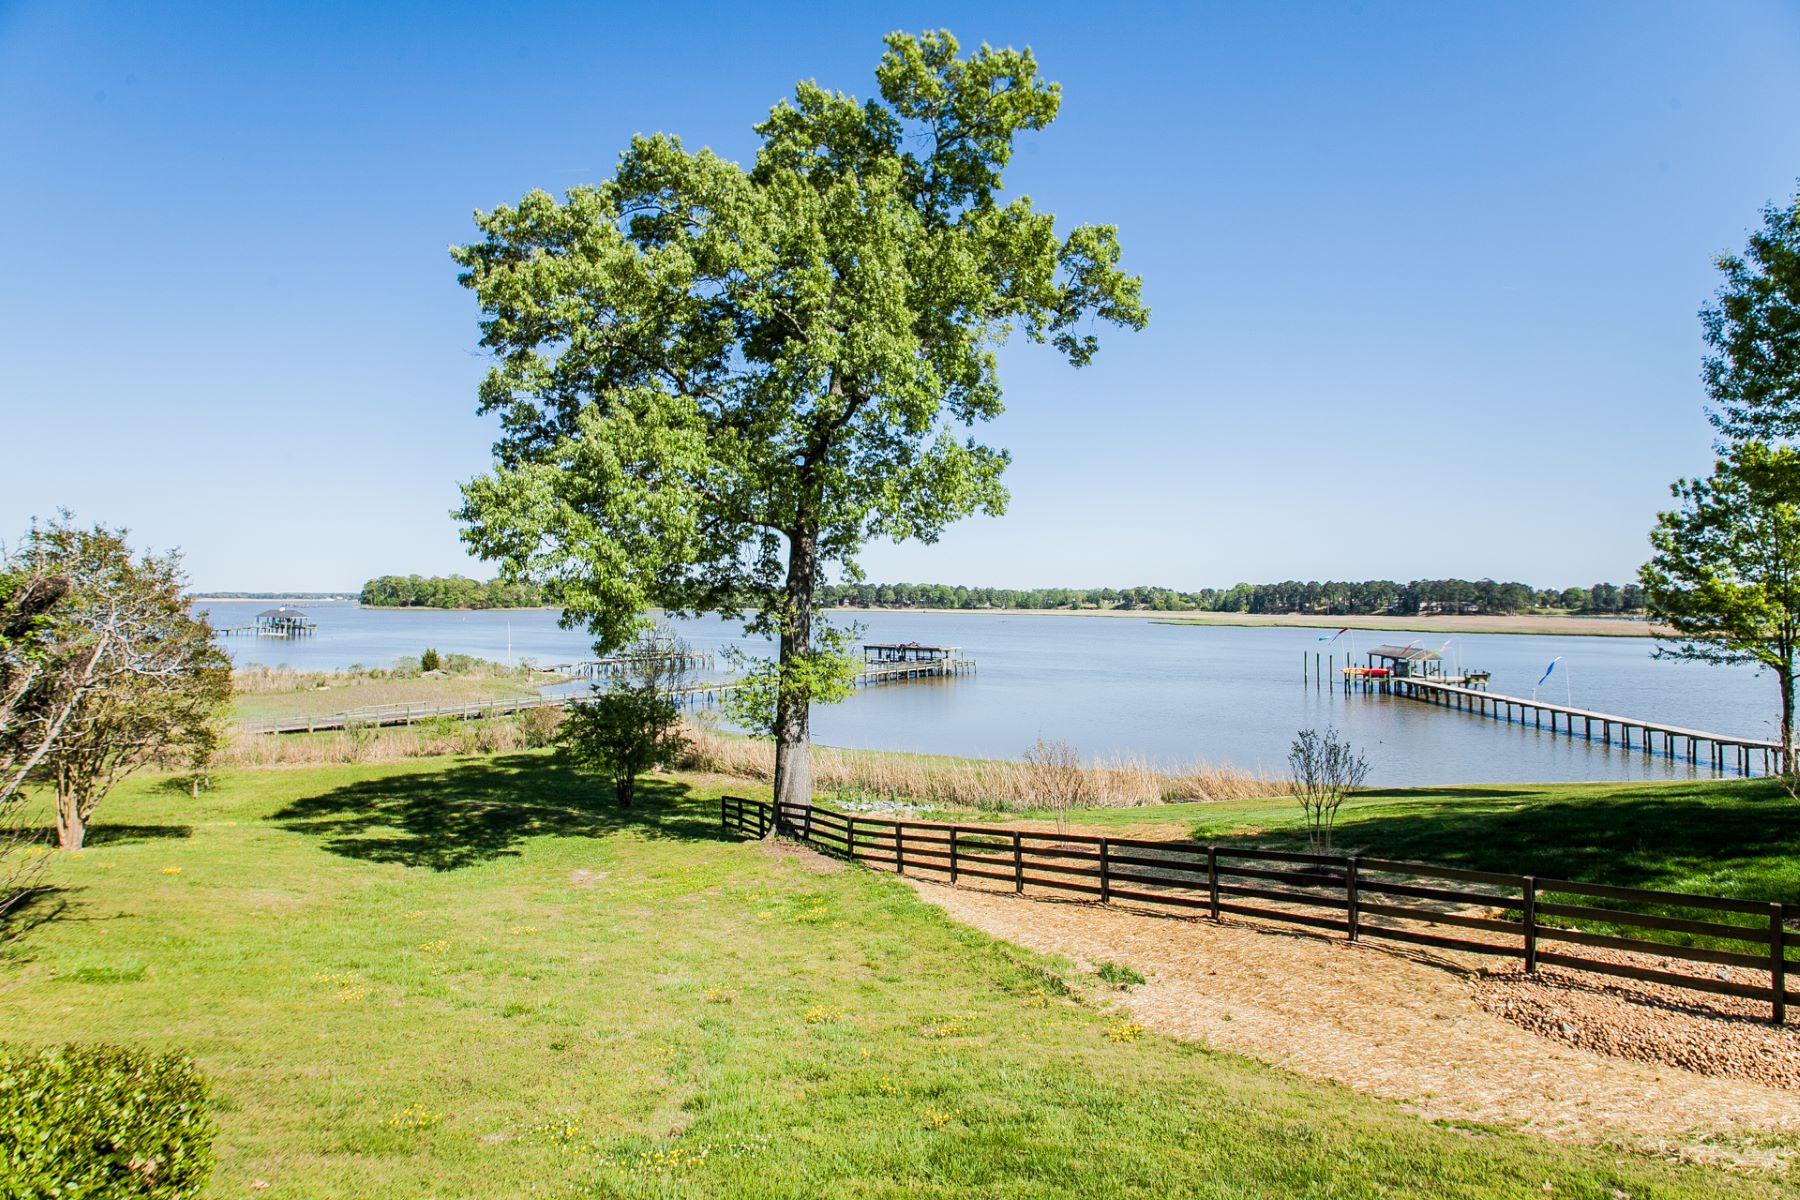 Single Family Home for Sale at River Oaks 261 River Oaks Ln Smithfield, Virginia 23430 United States